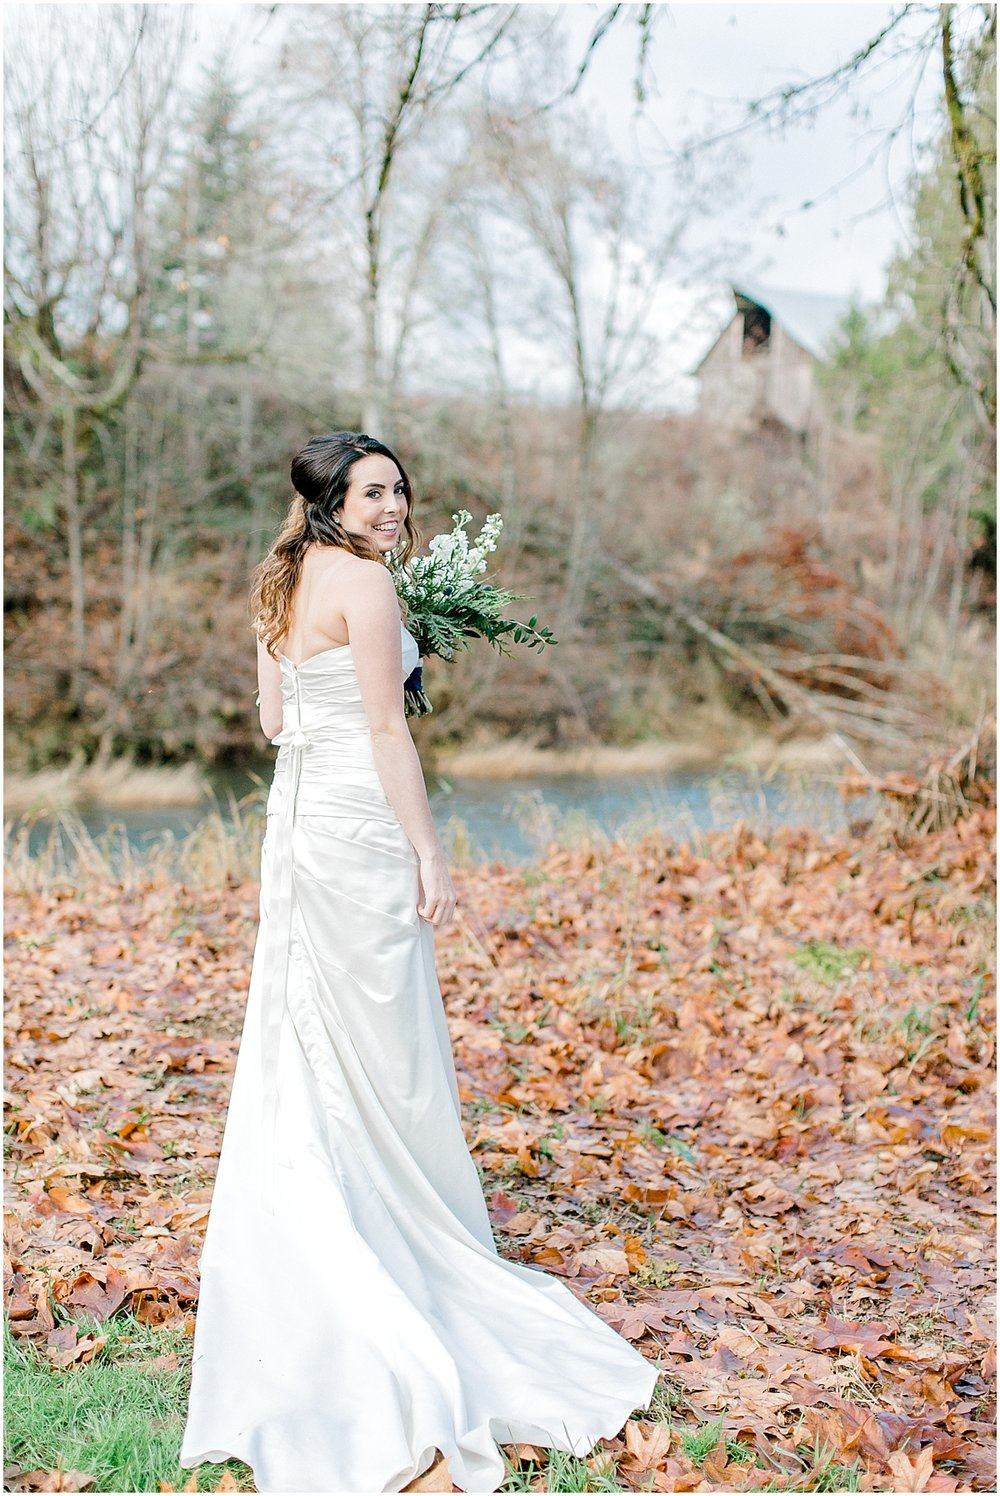 Chehalis Washington Winter Wedding Silver and White | Willapa Hills Farm Wedding | Eastham | Emma Rose Company PNW Light and Airy Wedding Photographer_0031.jpg